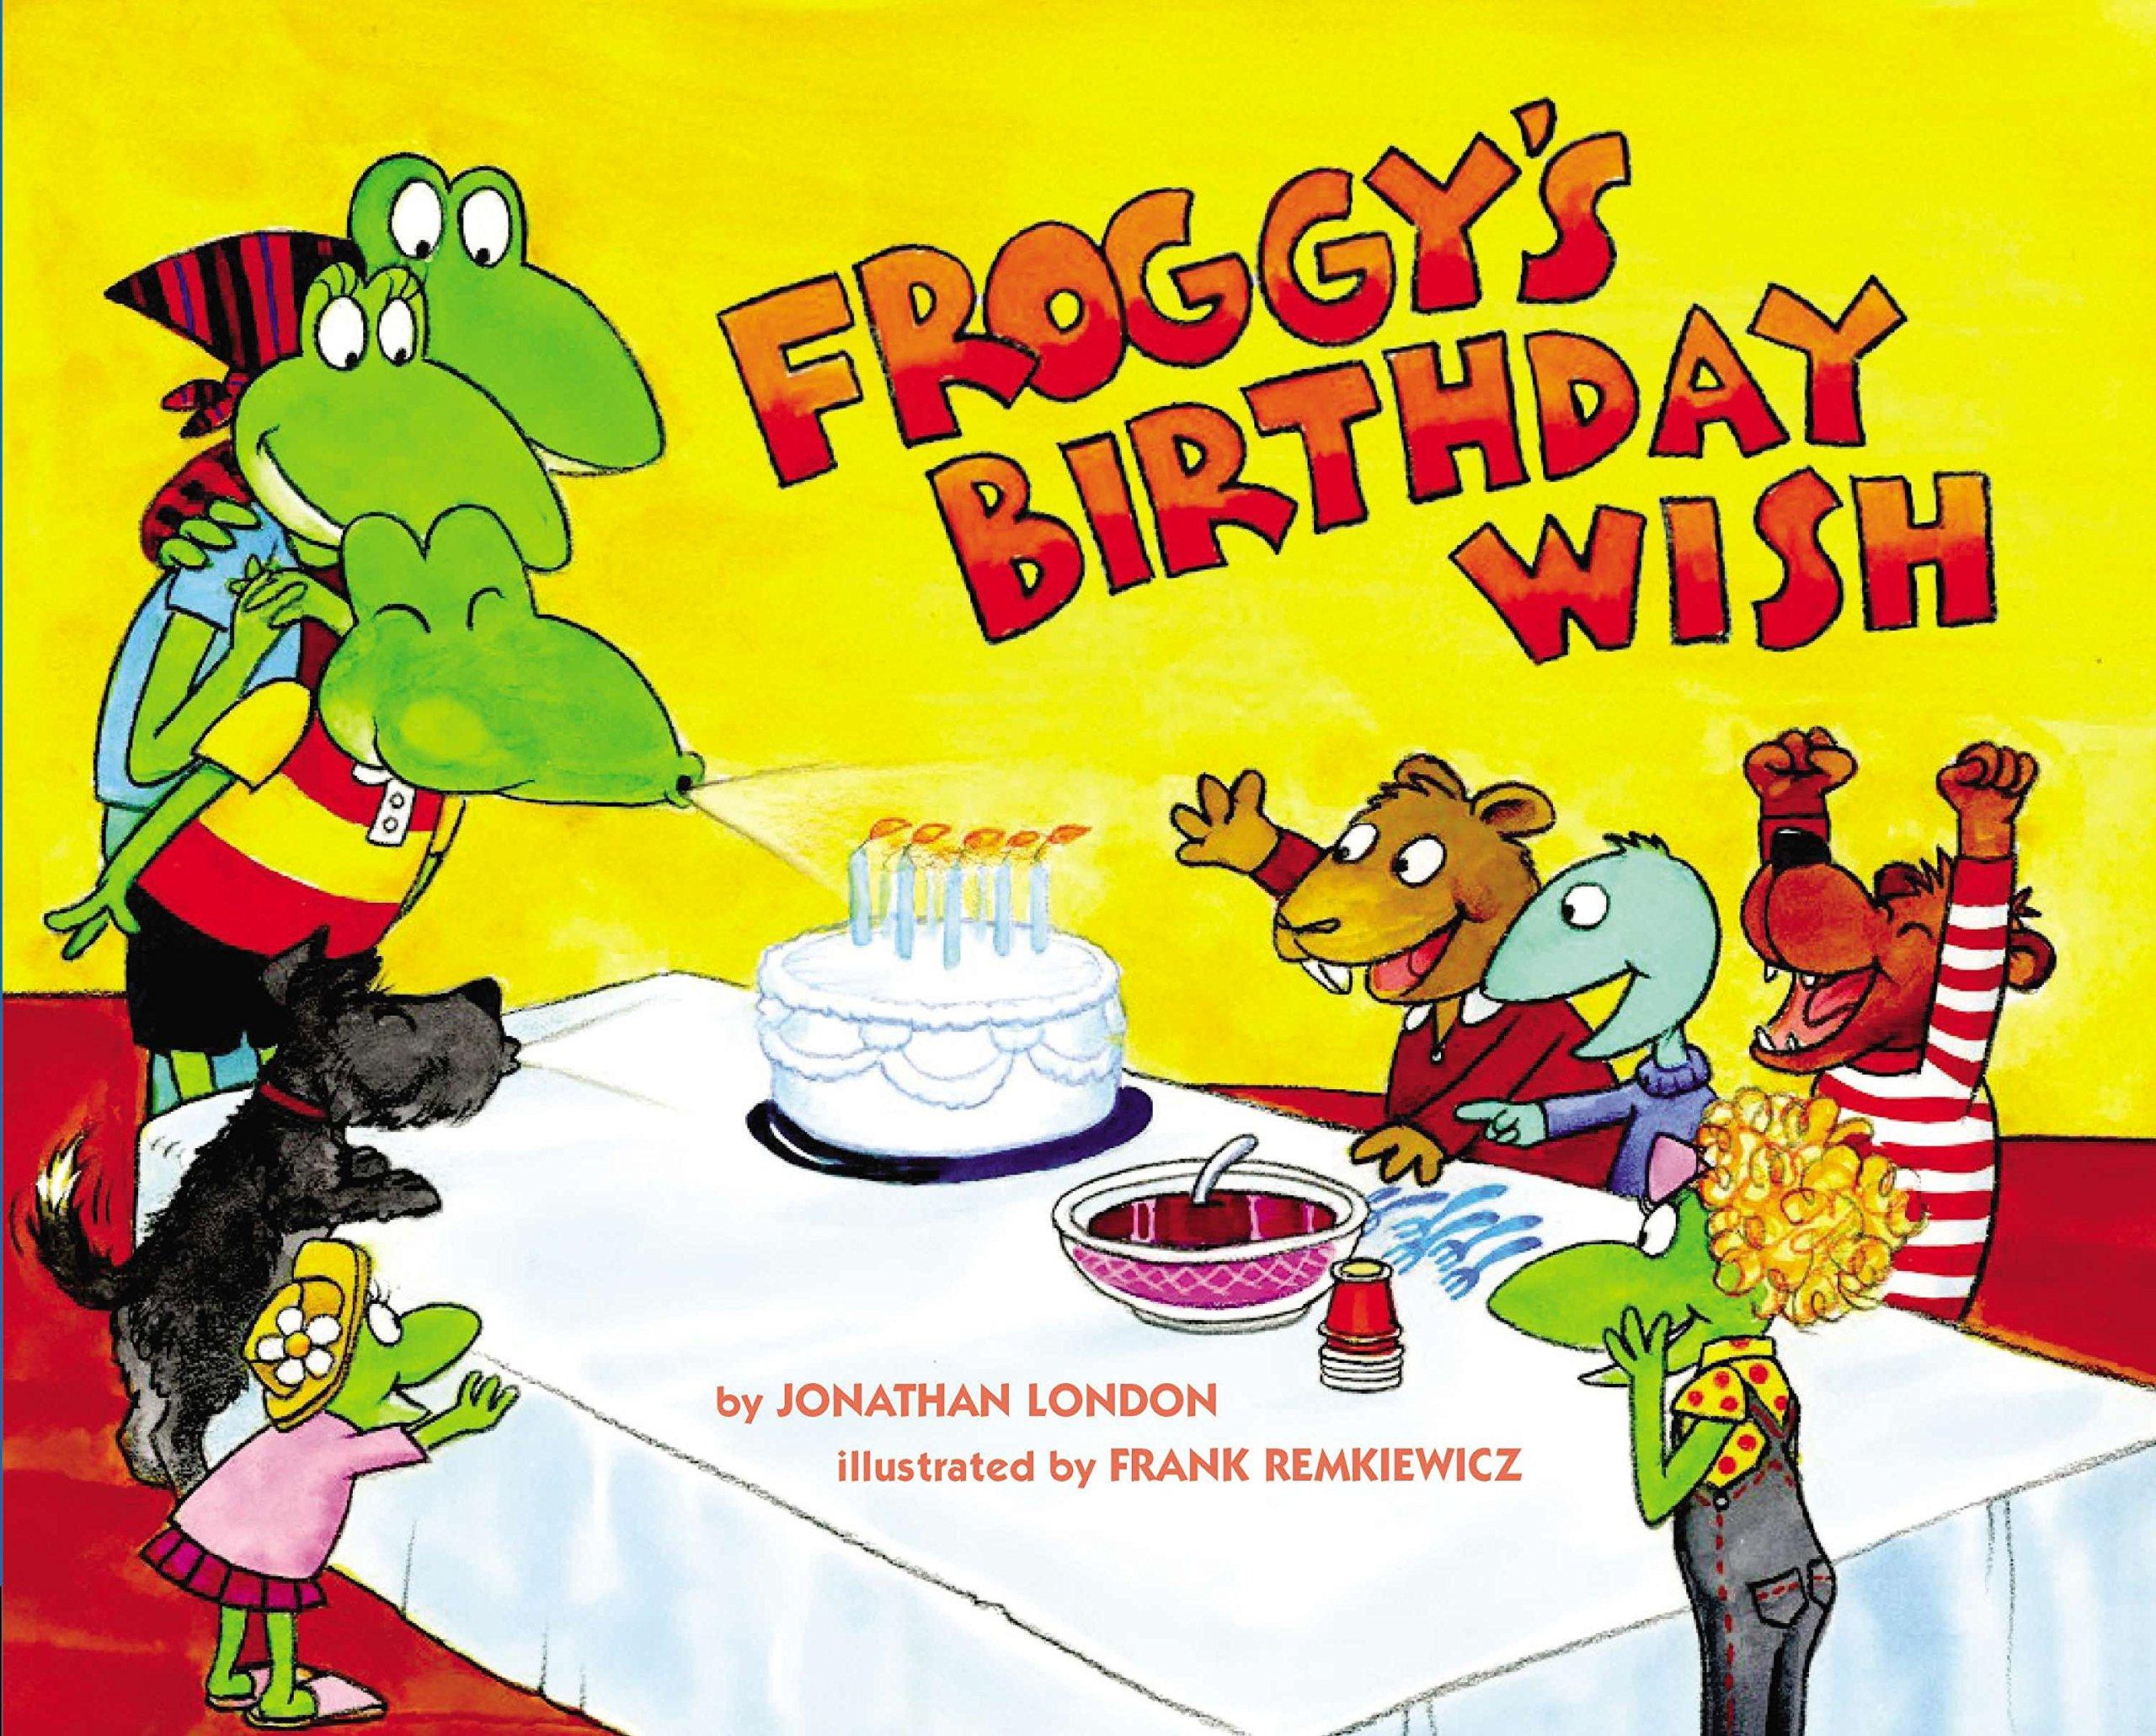 Froggy's Birthday Wish